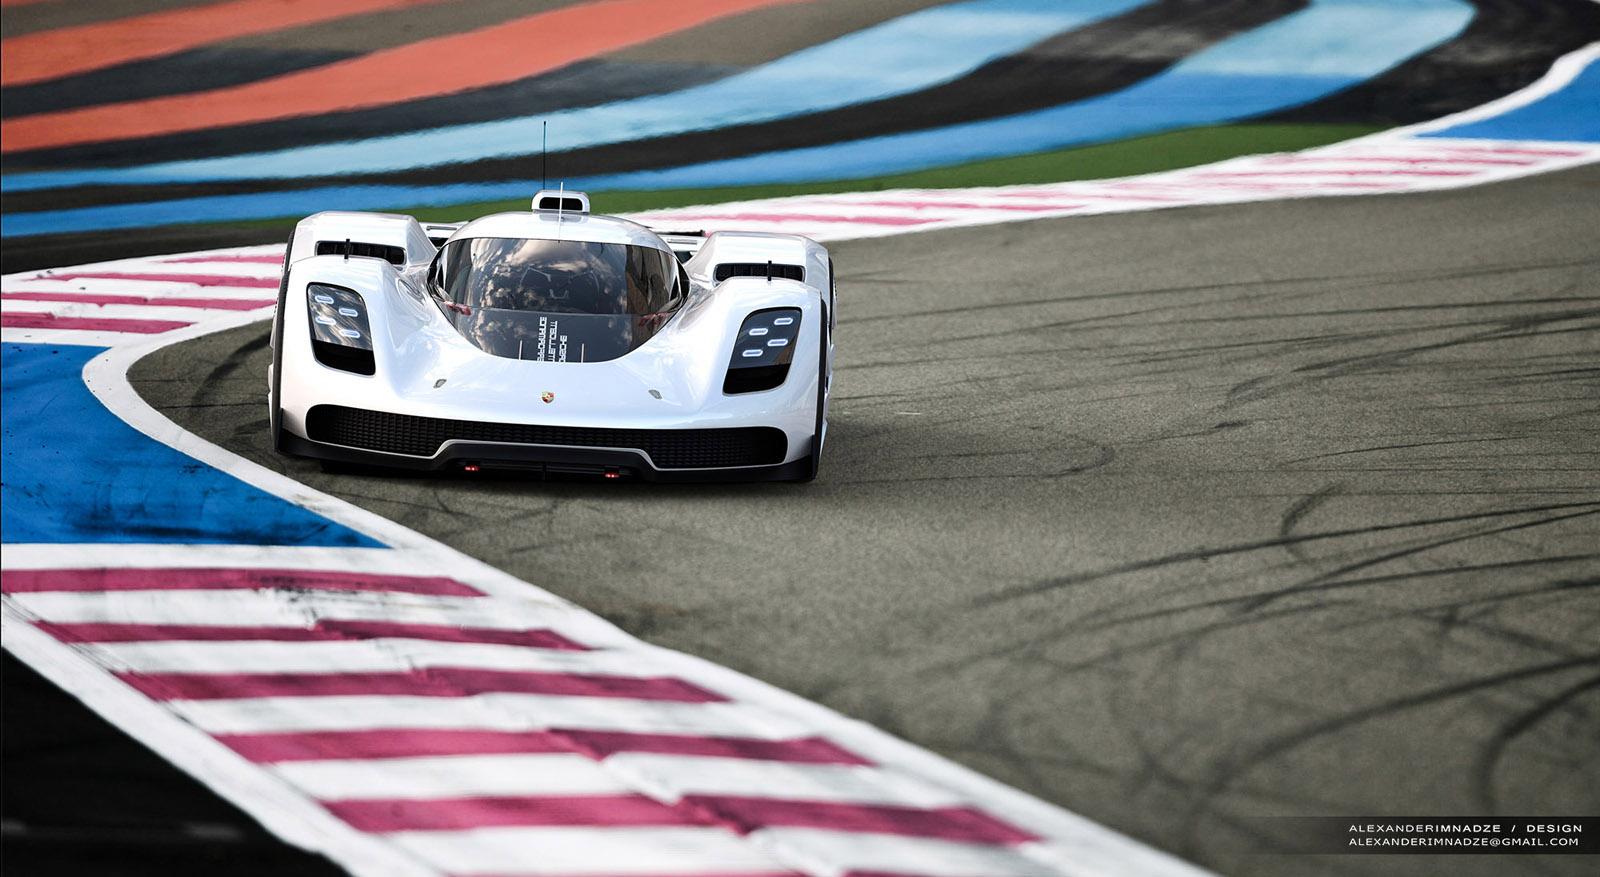 Porsche 906917 Concept Is One Designers Stunning Vision